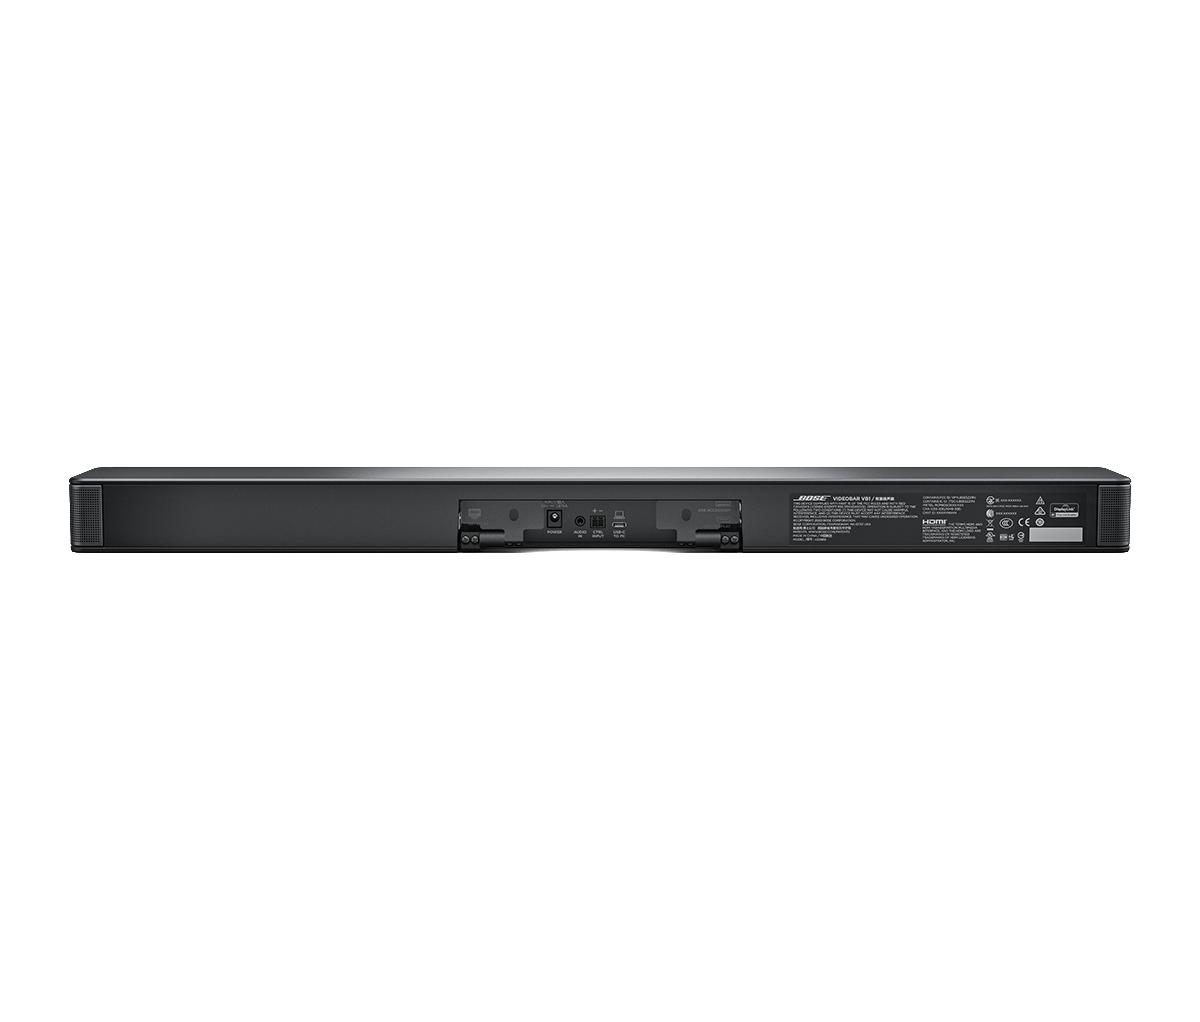 Bose Videobar VB1 back.png